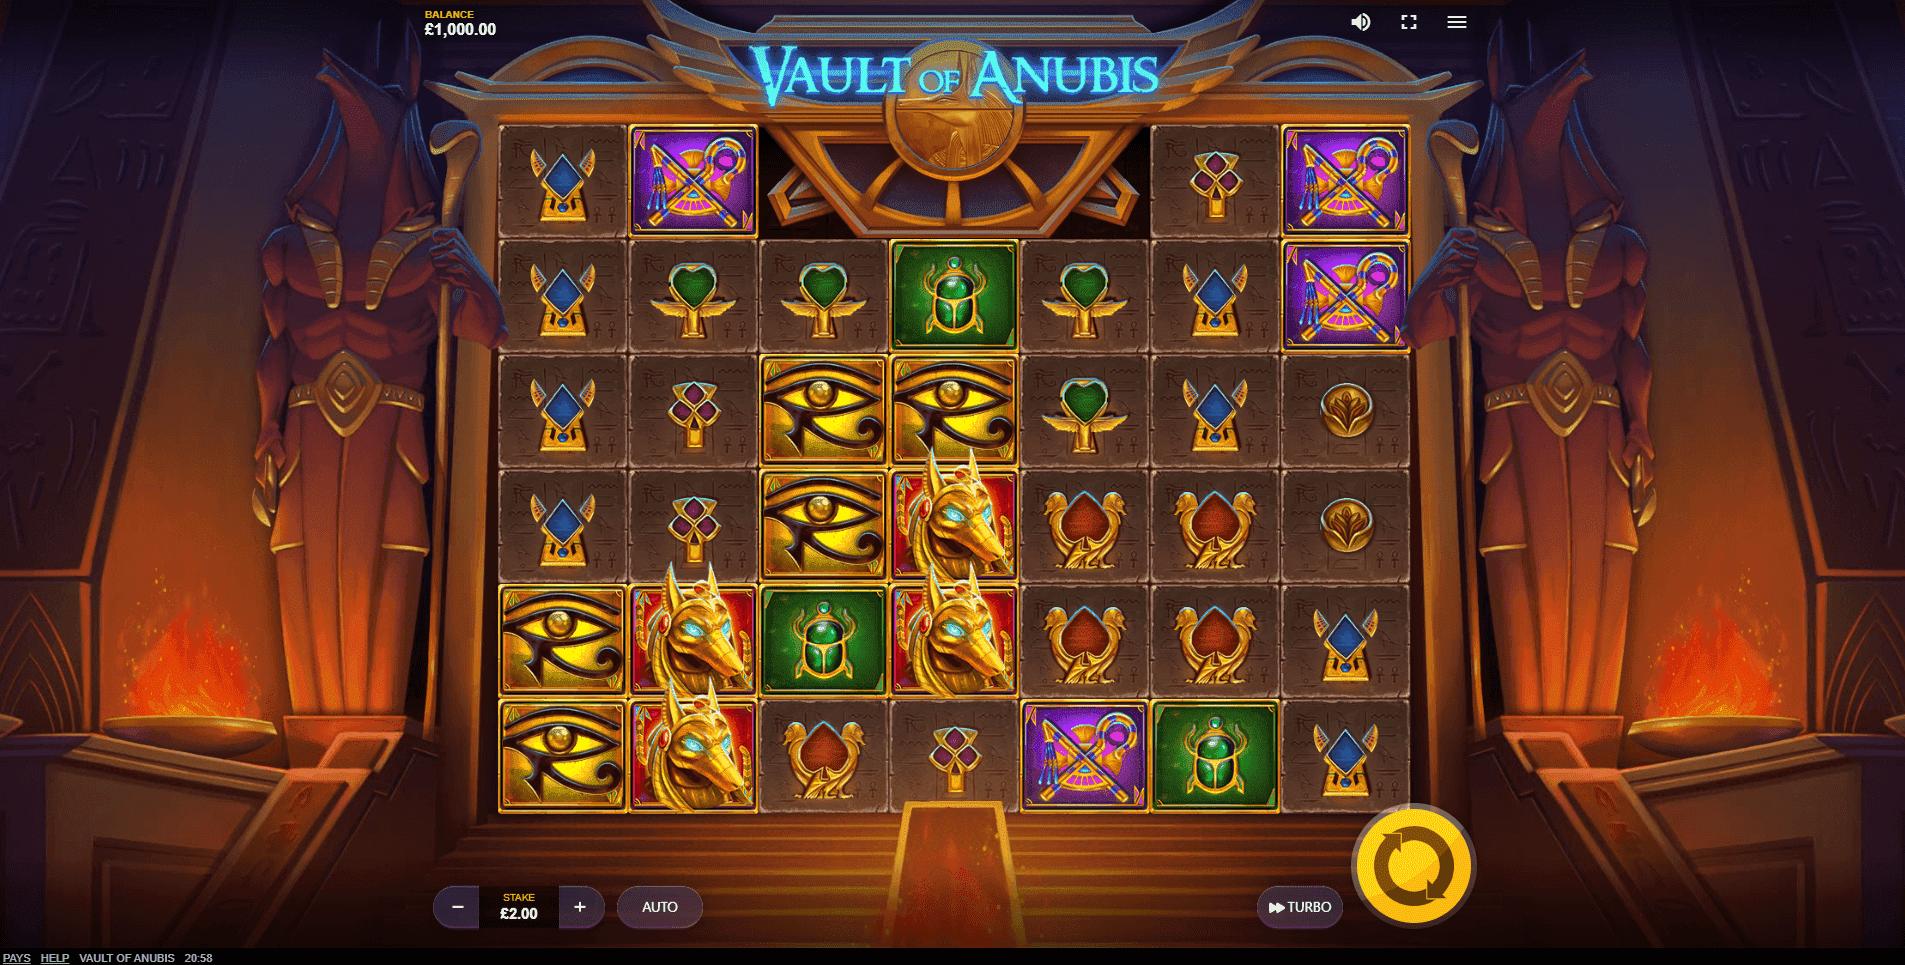 Vault of Anubis slot machine screenshot